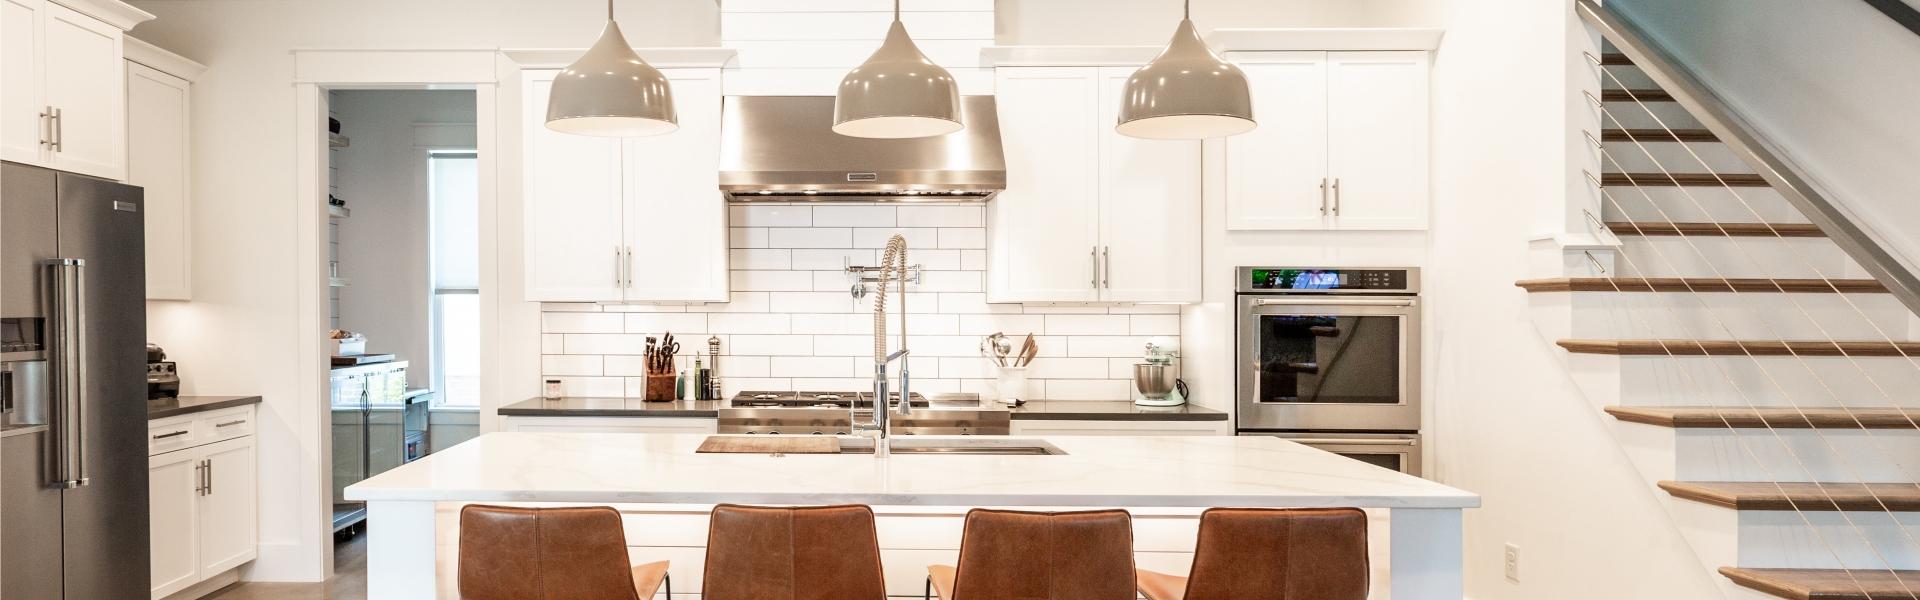 Savannah kitchen by Marsh Cabinets